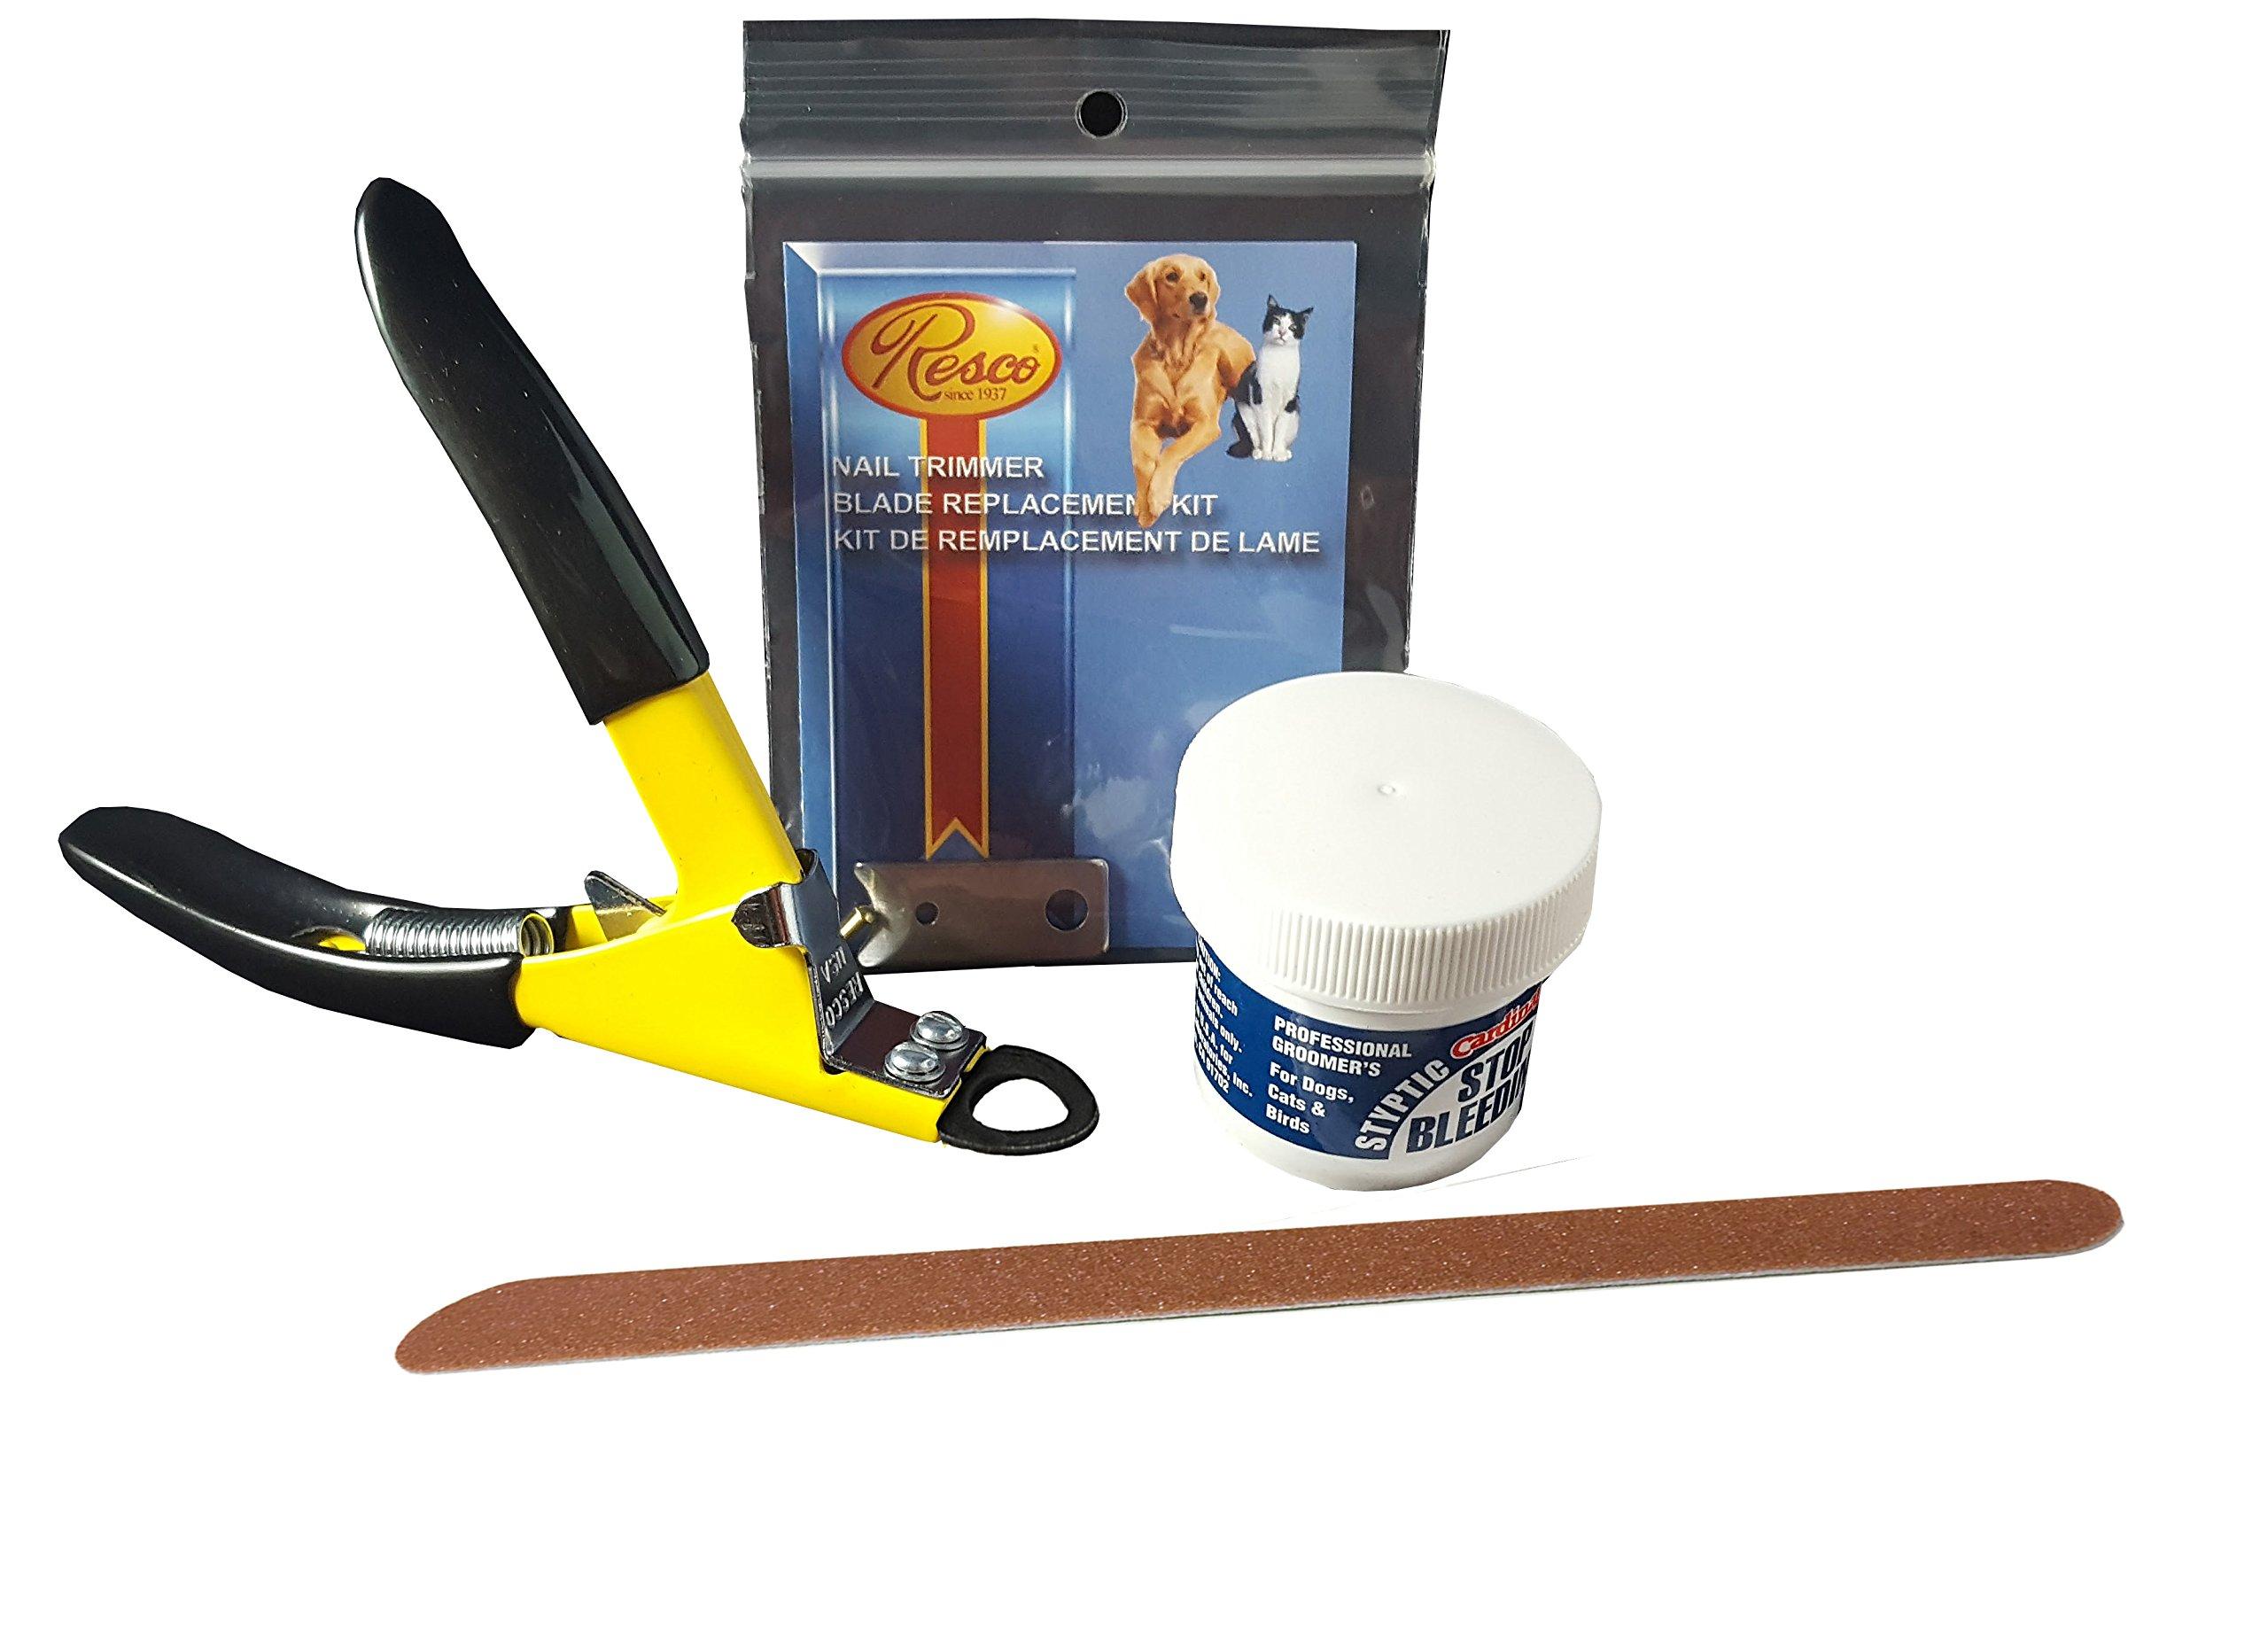 Resco Professional Nail Grooming Kit, Large